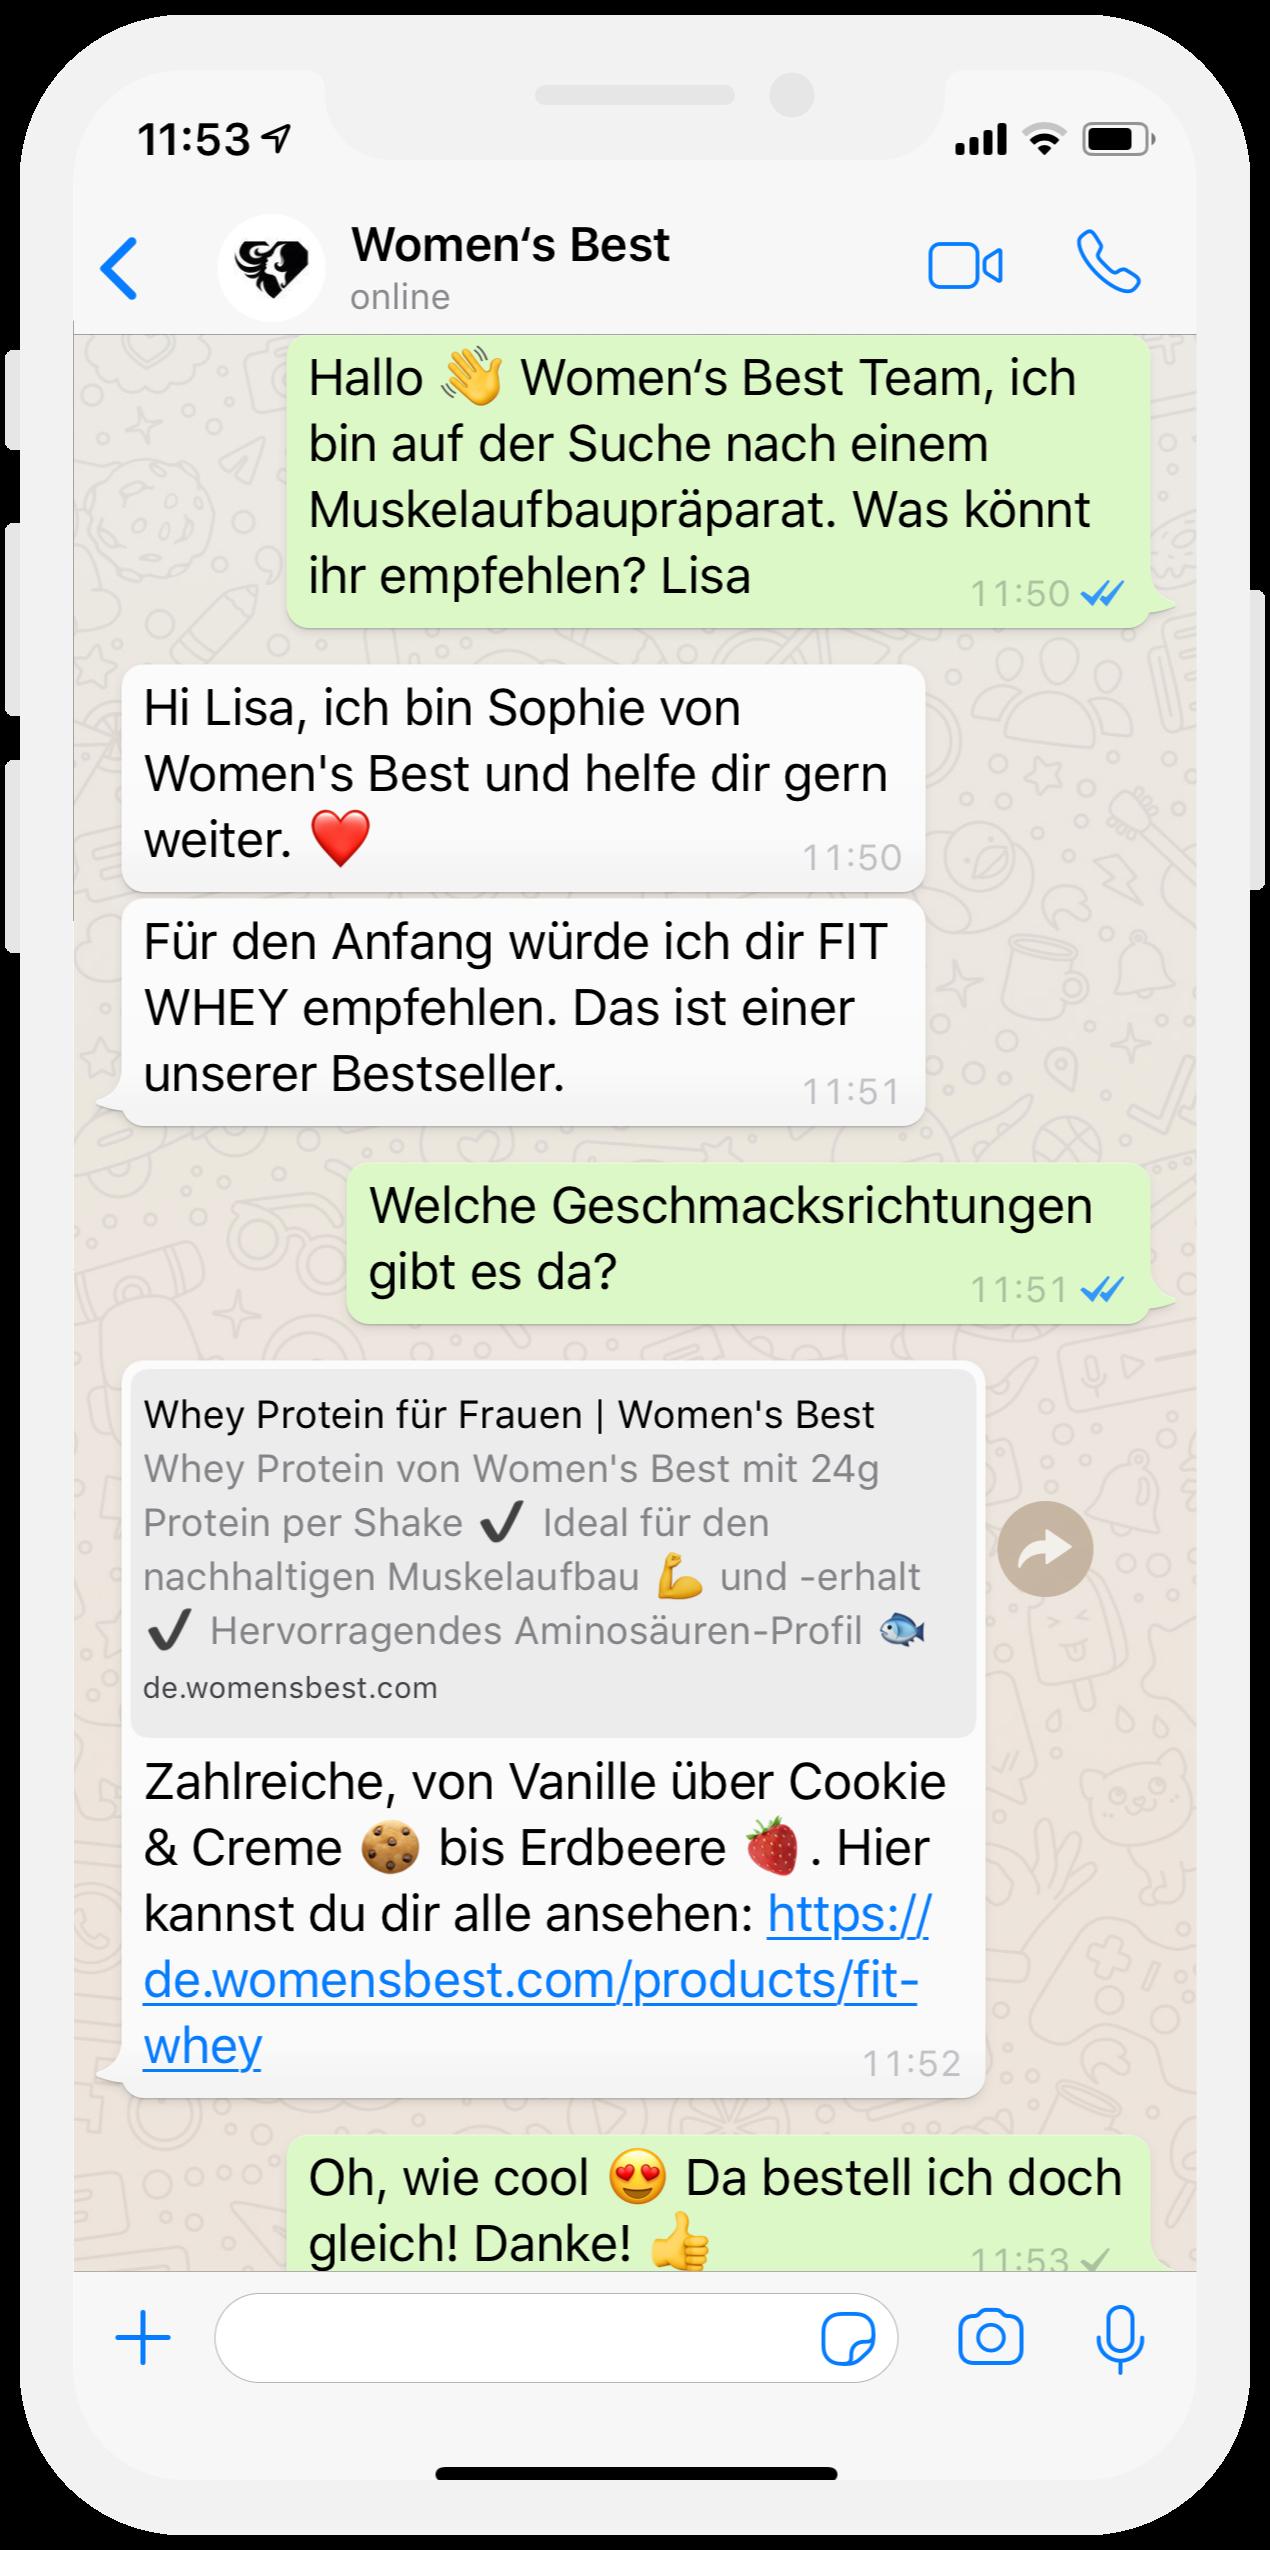 Nr von frauen whatsapp Whatsapp